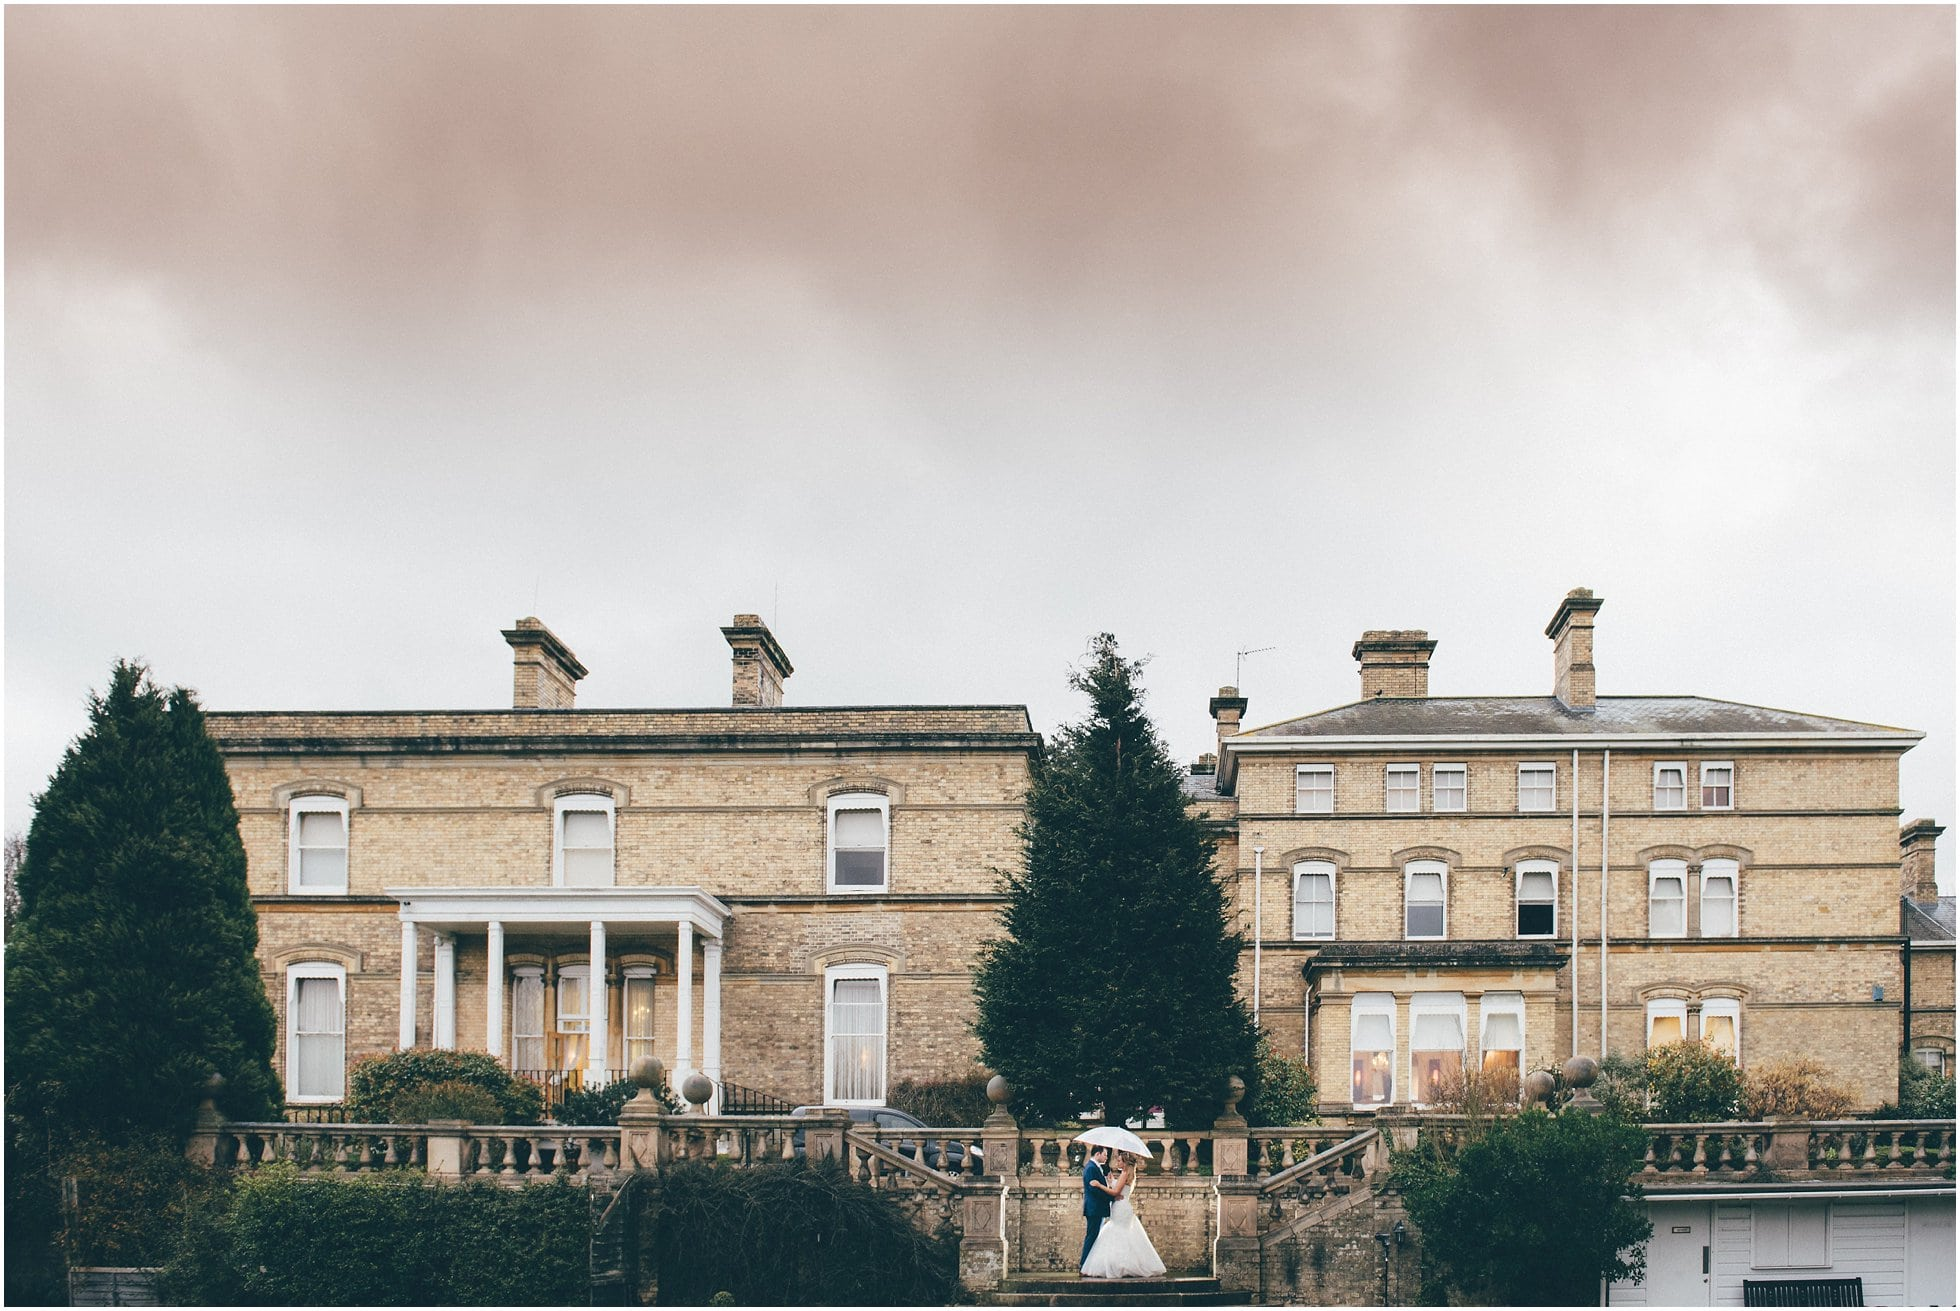 Ponsbourne Park Hotel from far away. Wet wedding weather!